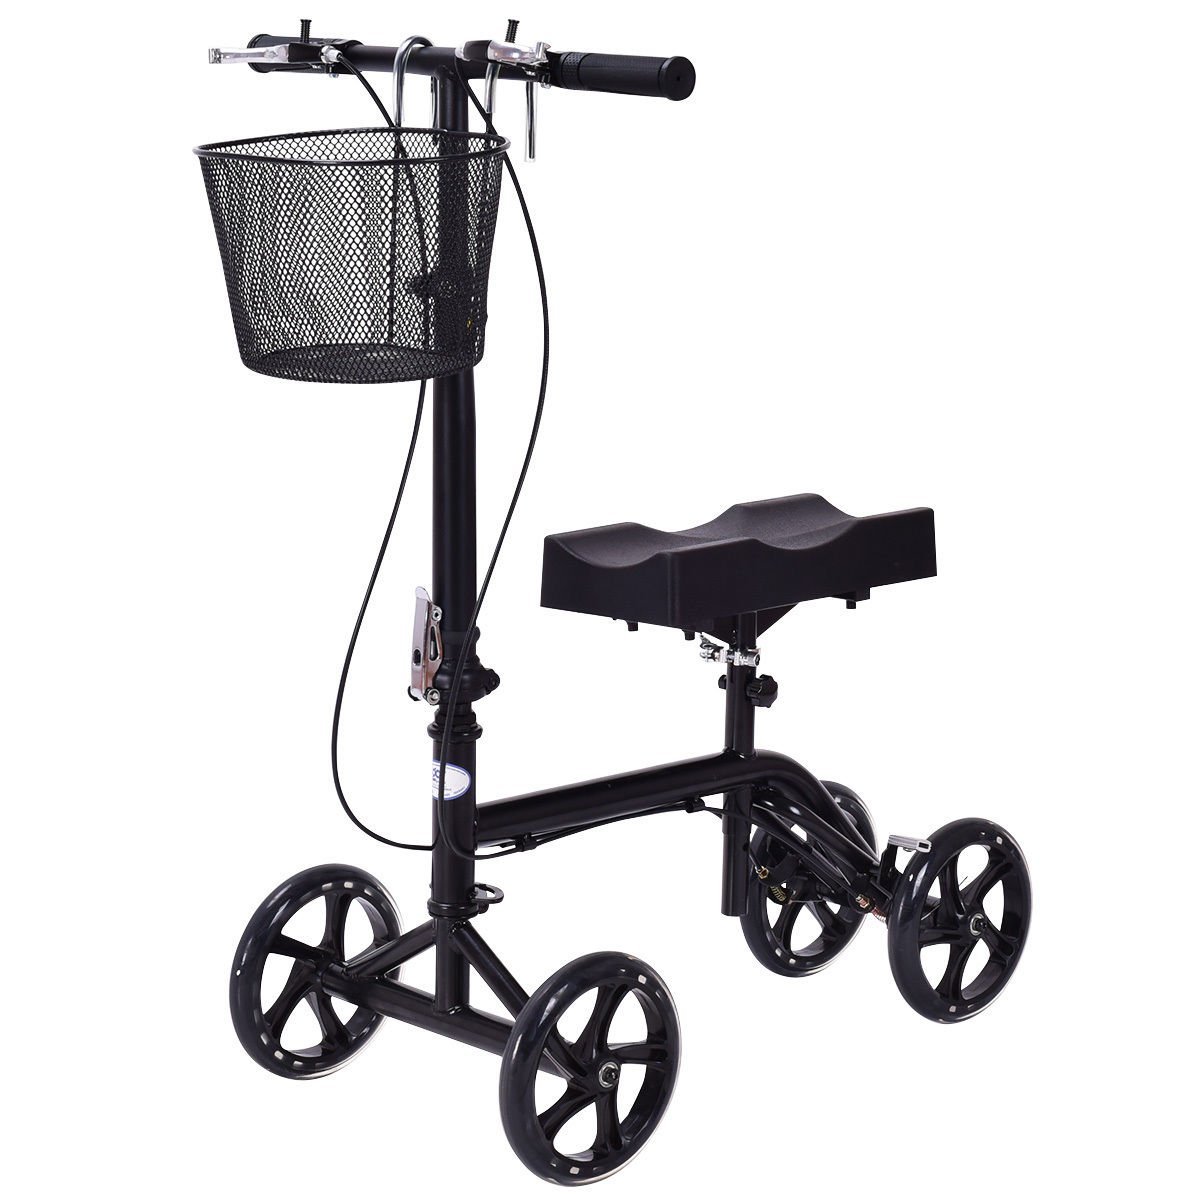 Goplus® Heavy Duty Knee Walker Steerable Knee Scooter Foldable Medical Knee Cycle Leg Walker Crutch W/ Deluxe Brake System & Basket in Black